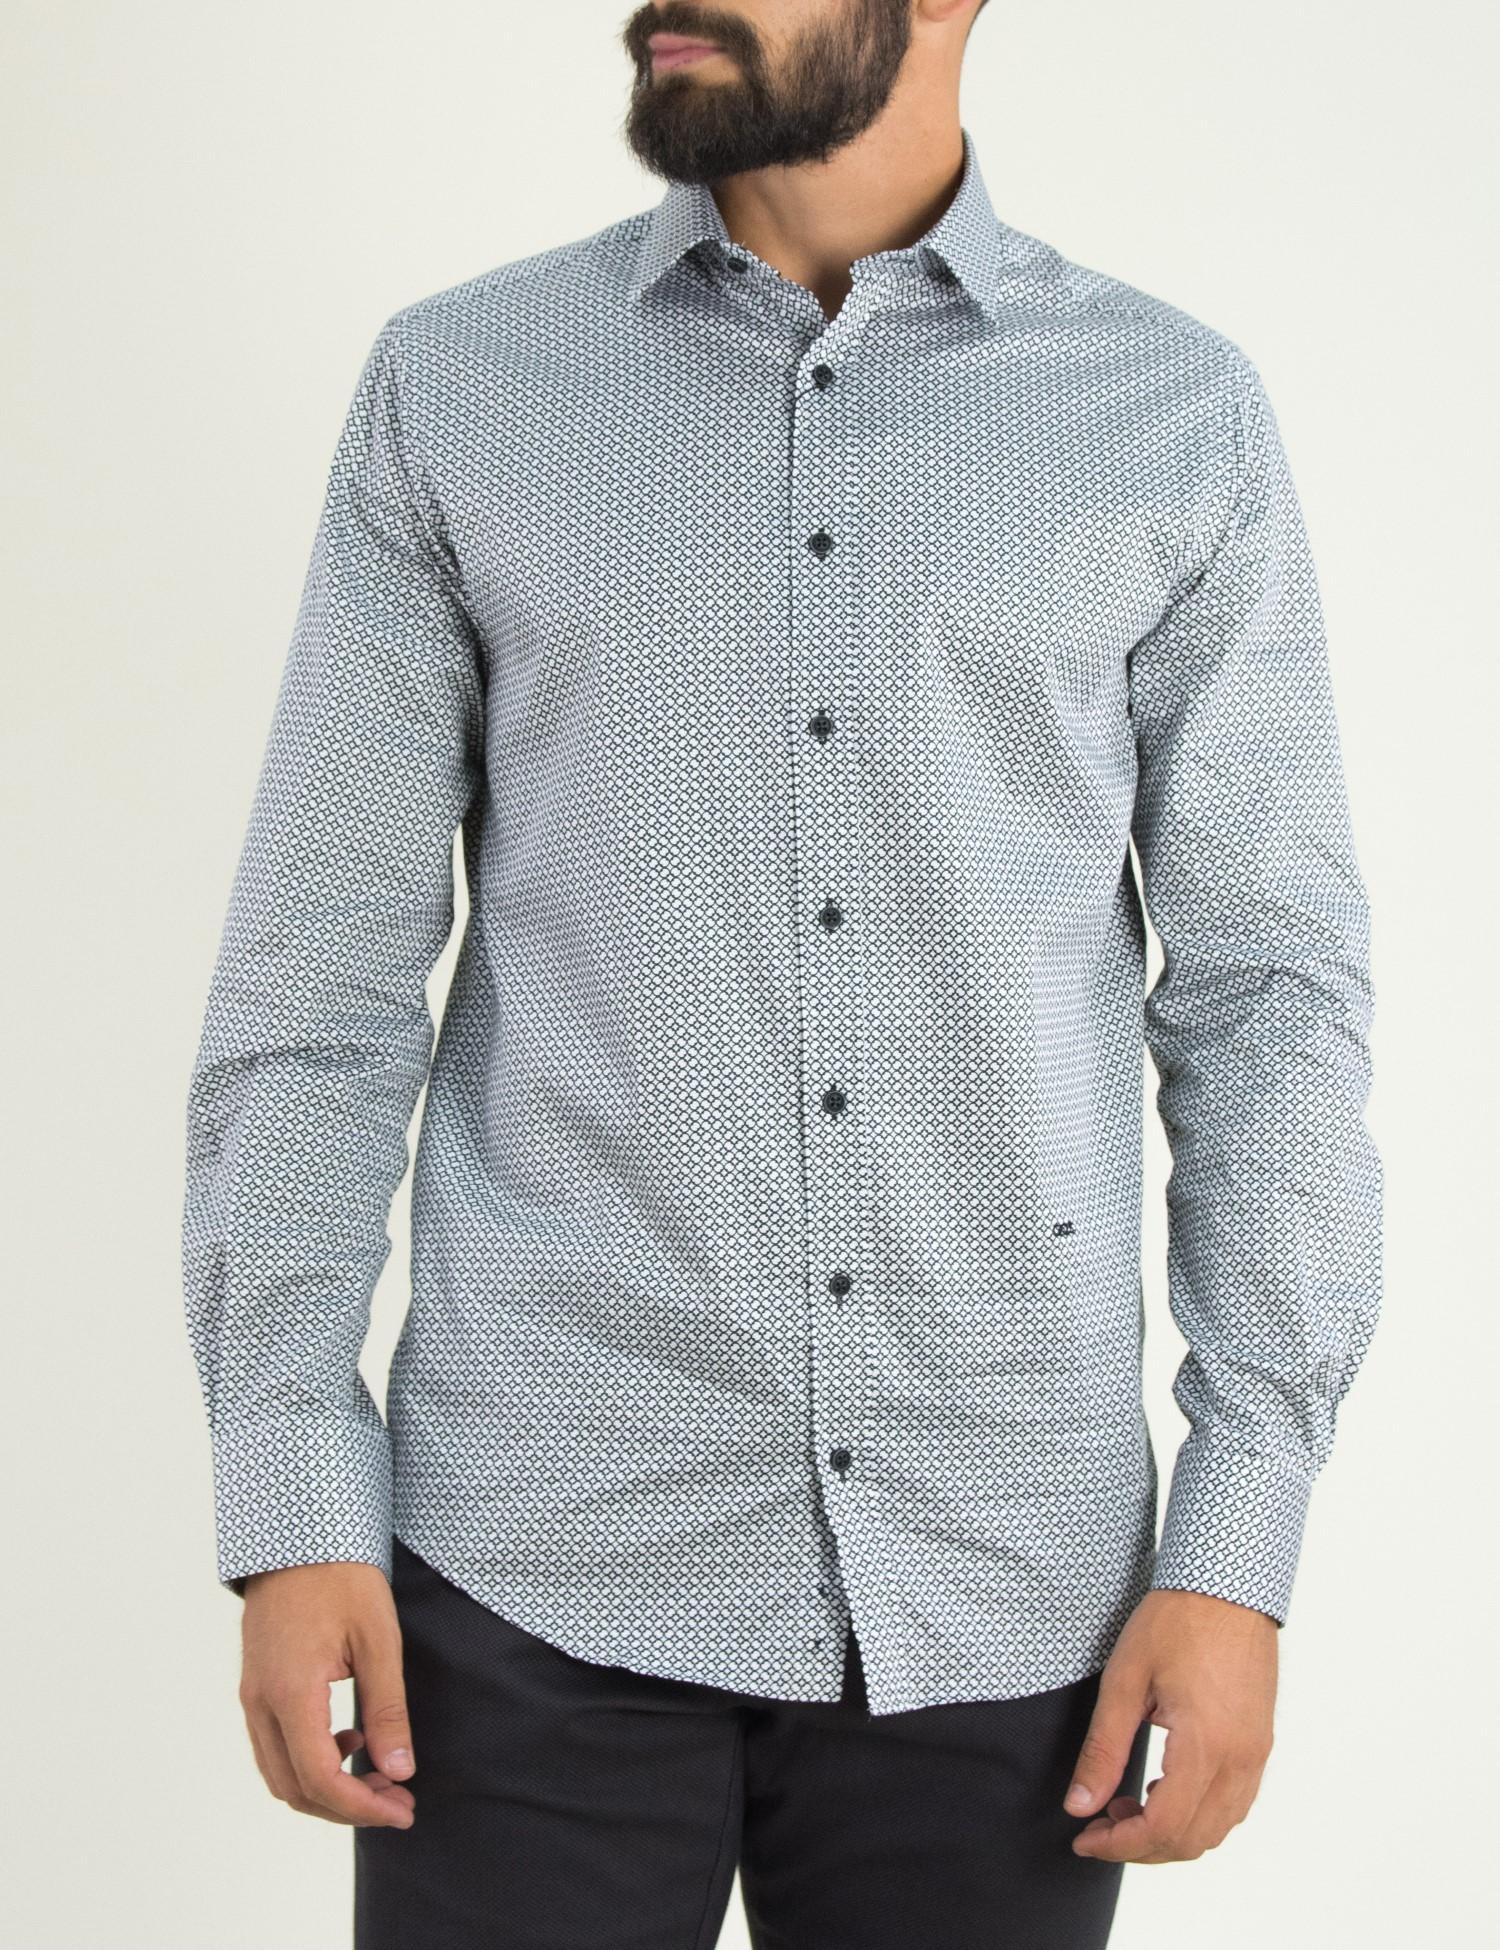 122fc8aa4d24 Ανδρικό λευκό πουκάμισο με μικροσχέδιο GioS 9506W18